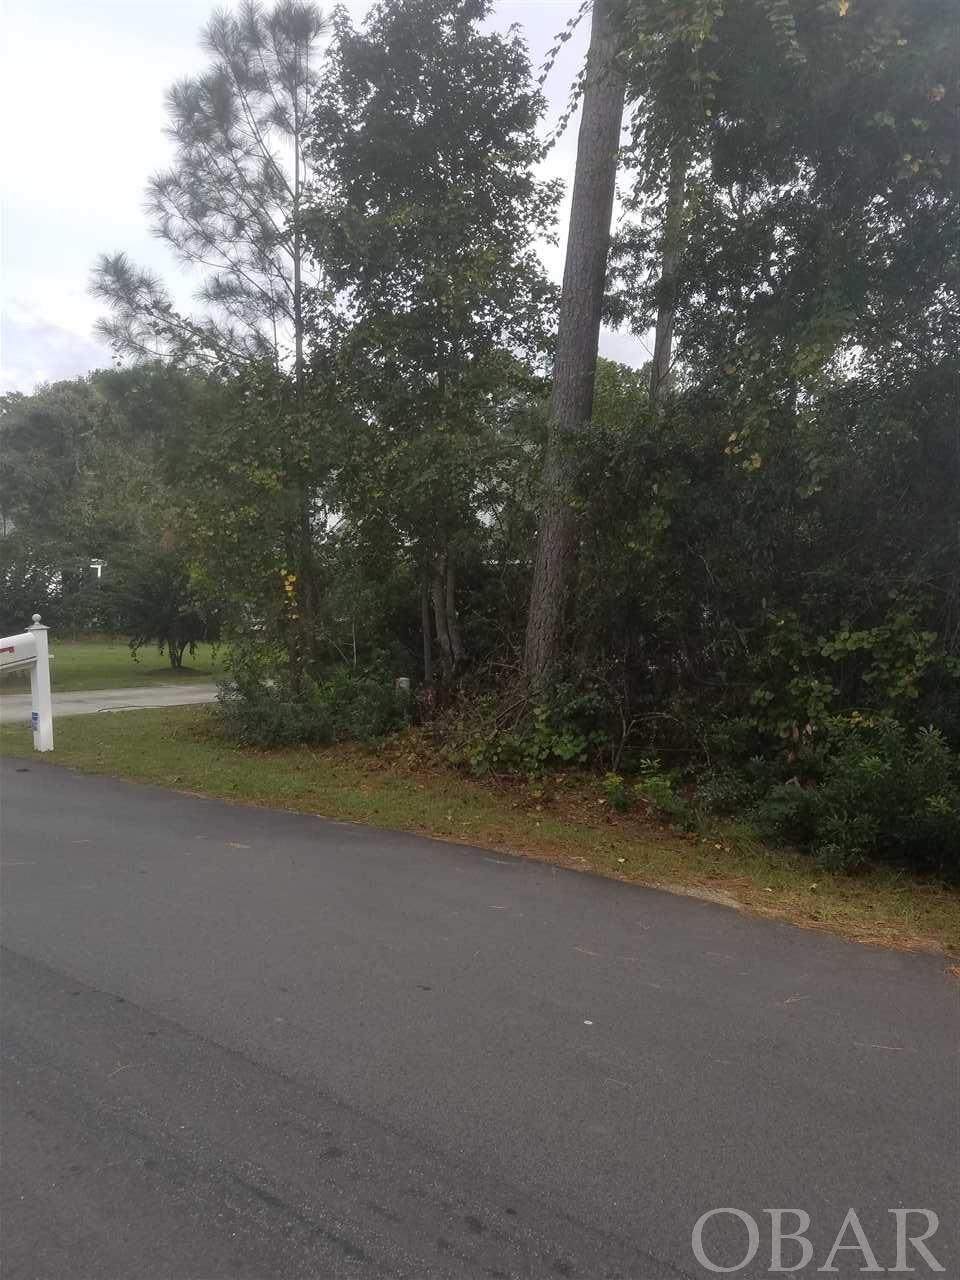 202 Brakewood Road,Manteo,NC 27954,Lots/land,Brakewood Road,98177